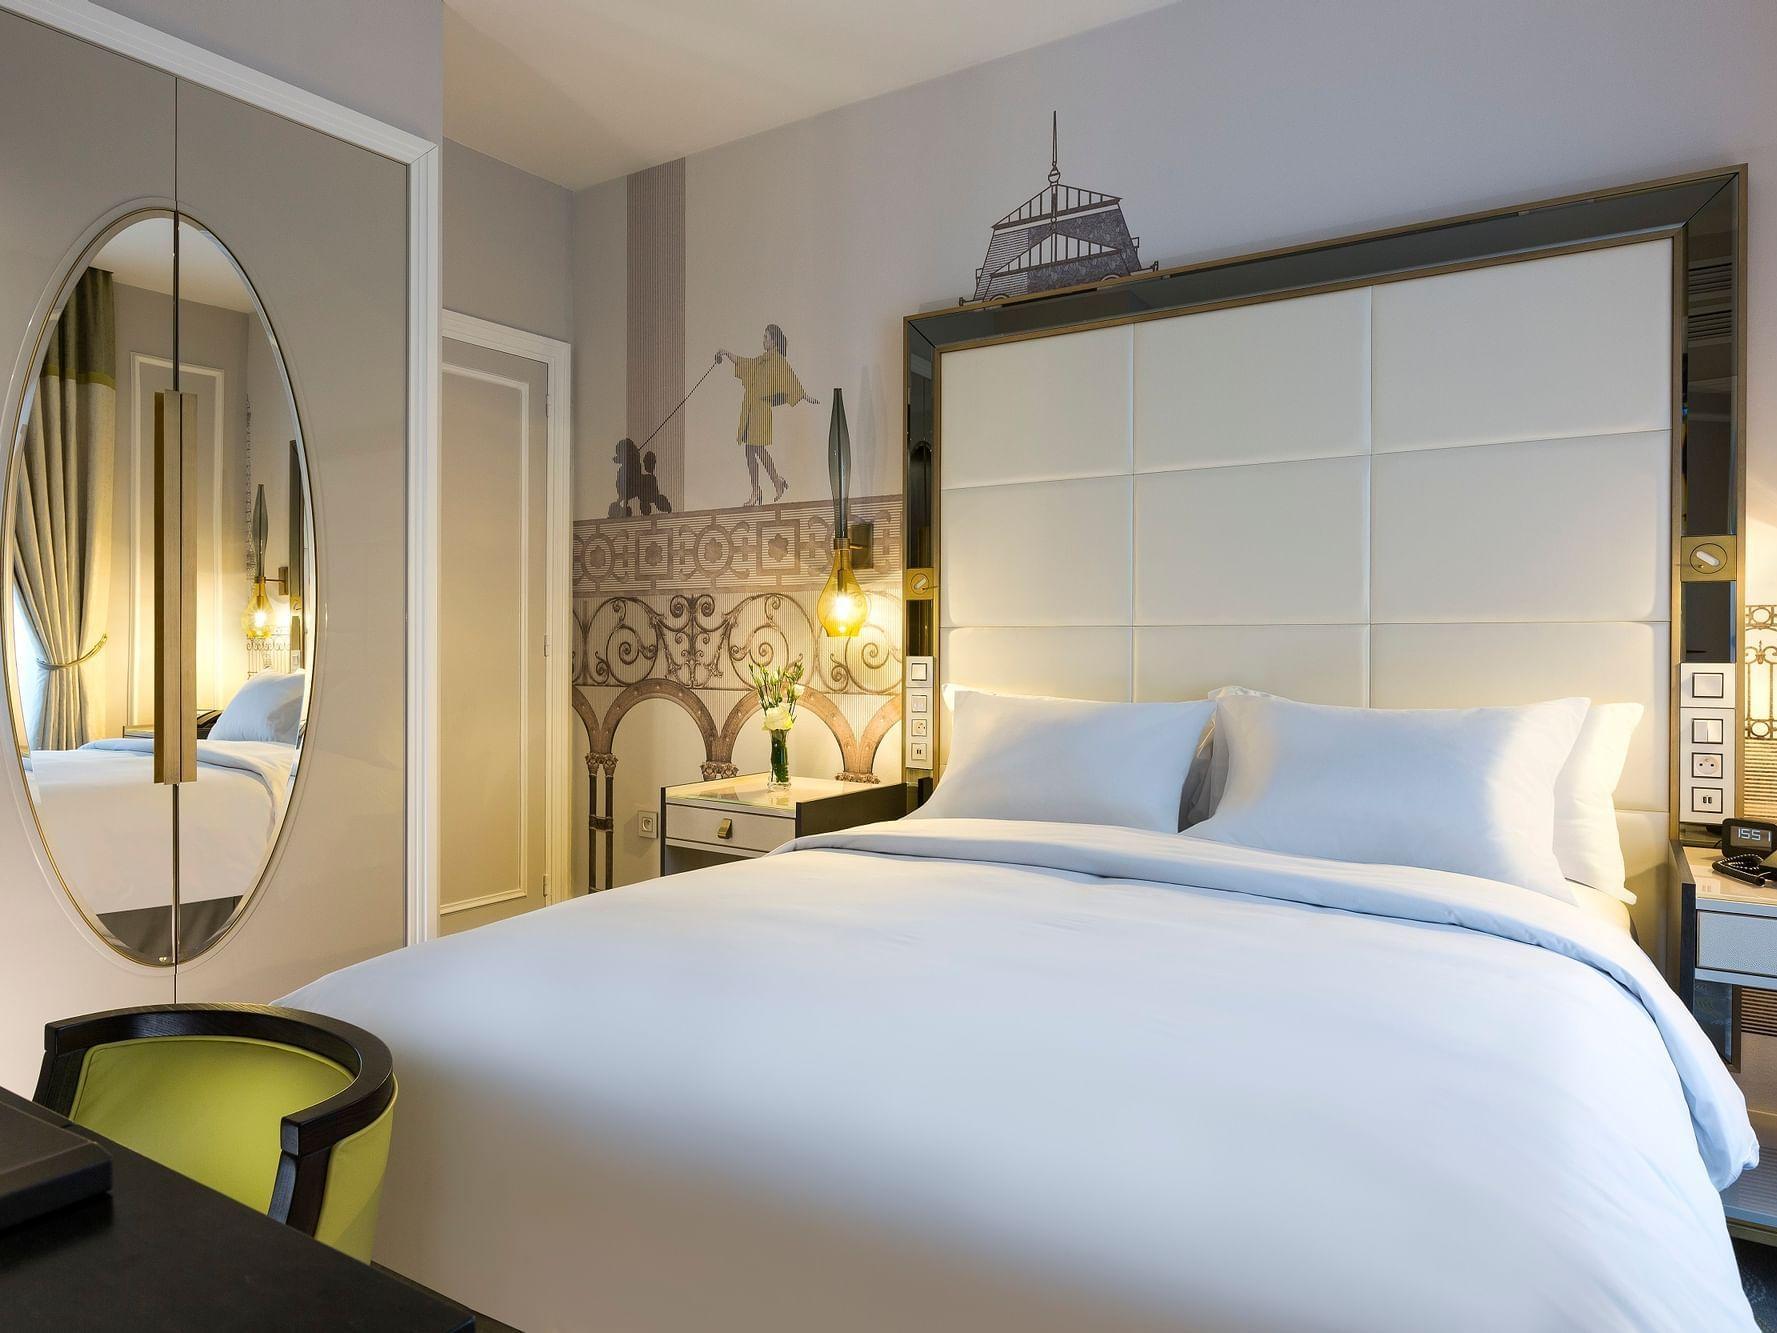 Bed & furniture in Superior Room at Hilton Paris Opera Hotel